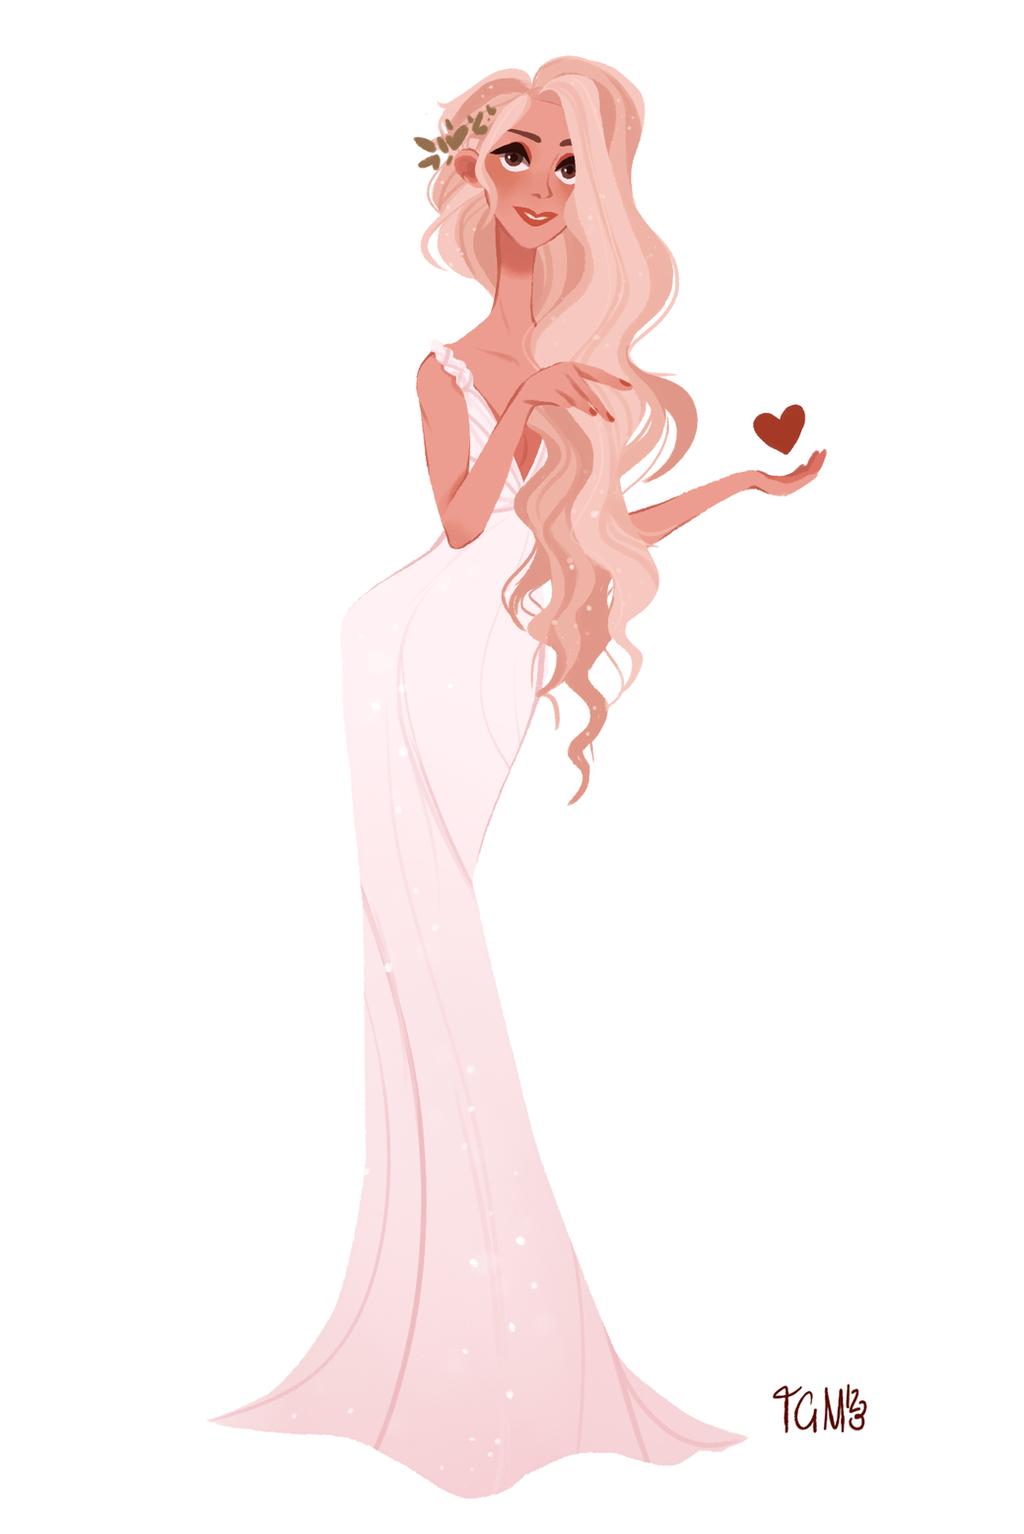 Aphrodite by TheGingerMenace123